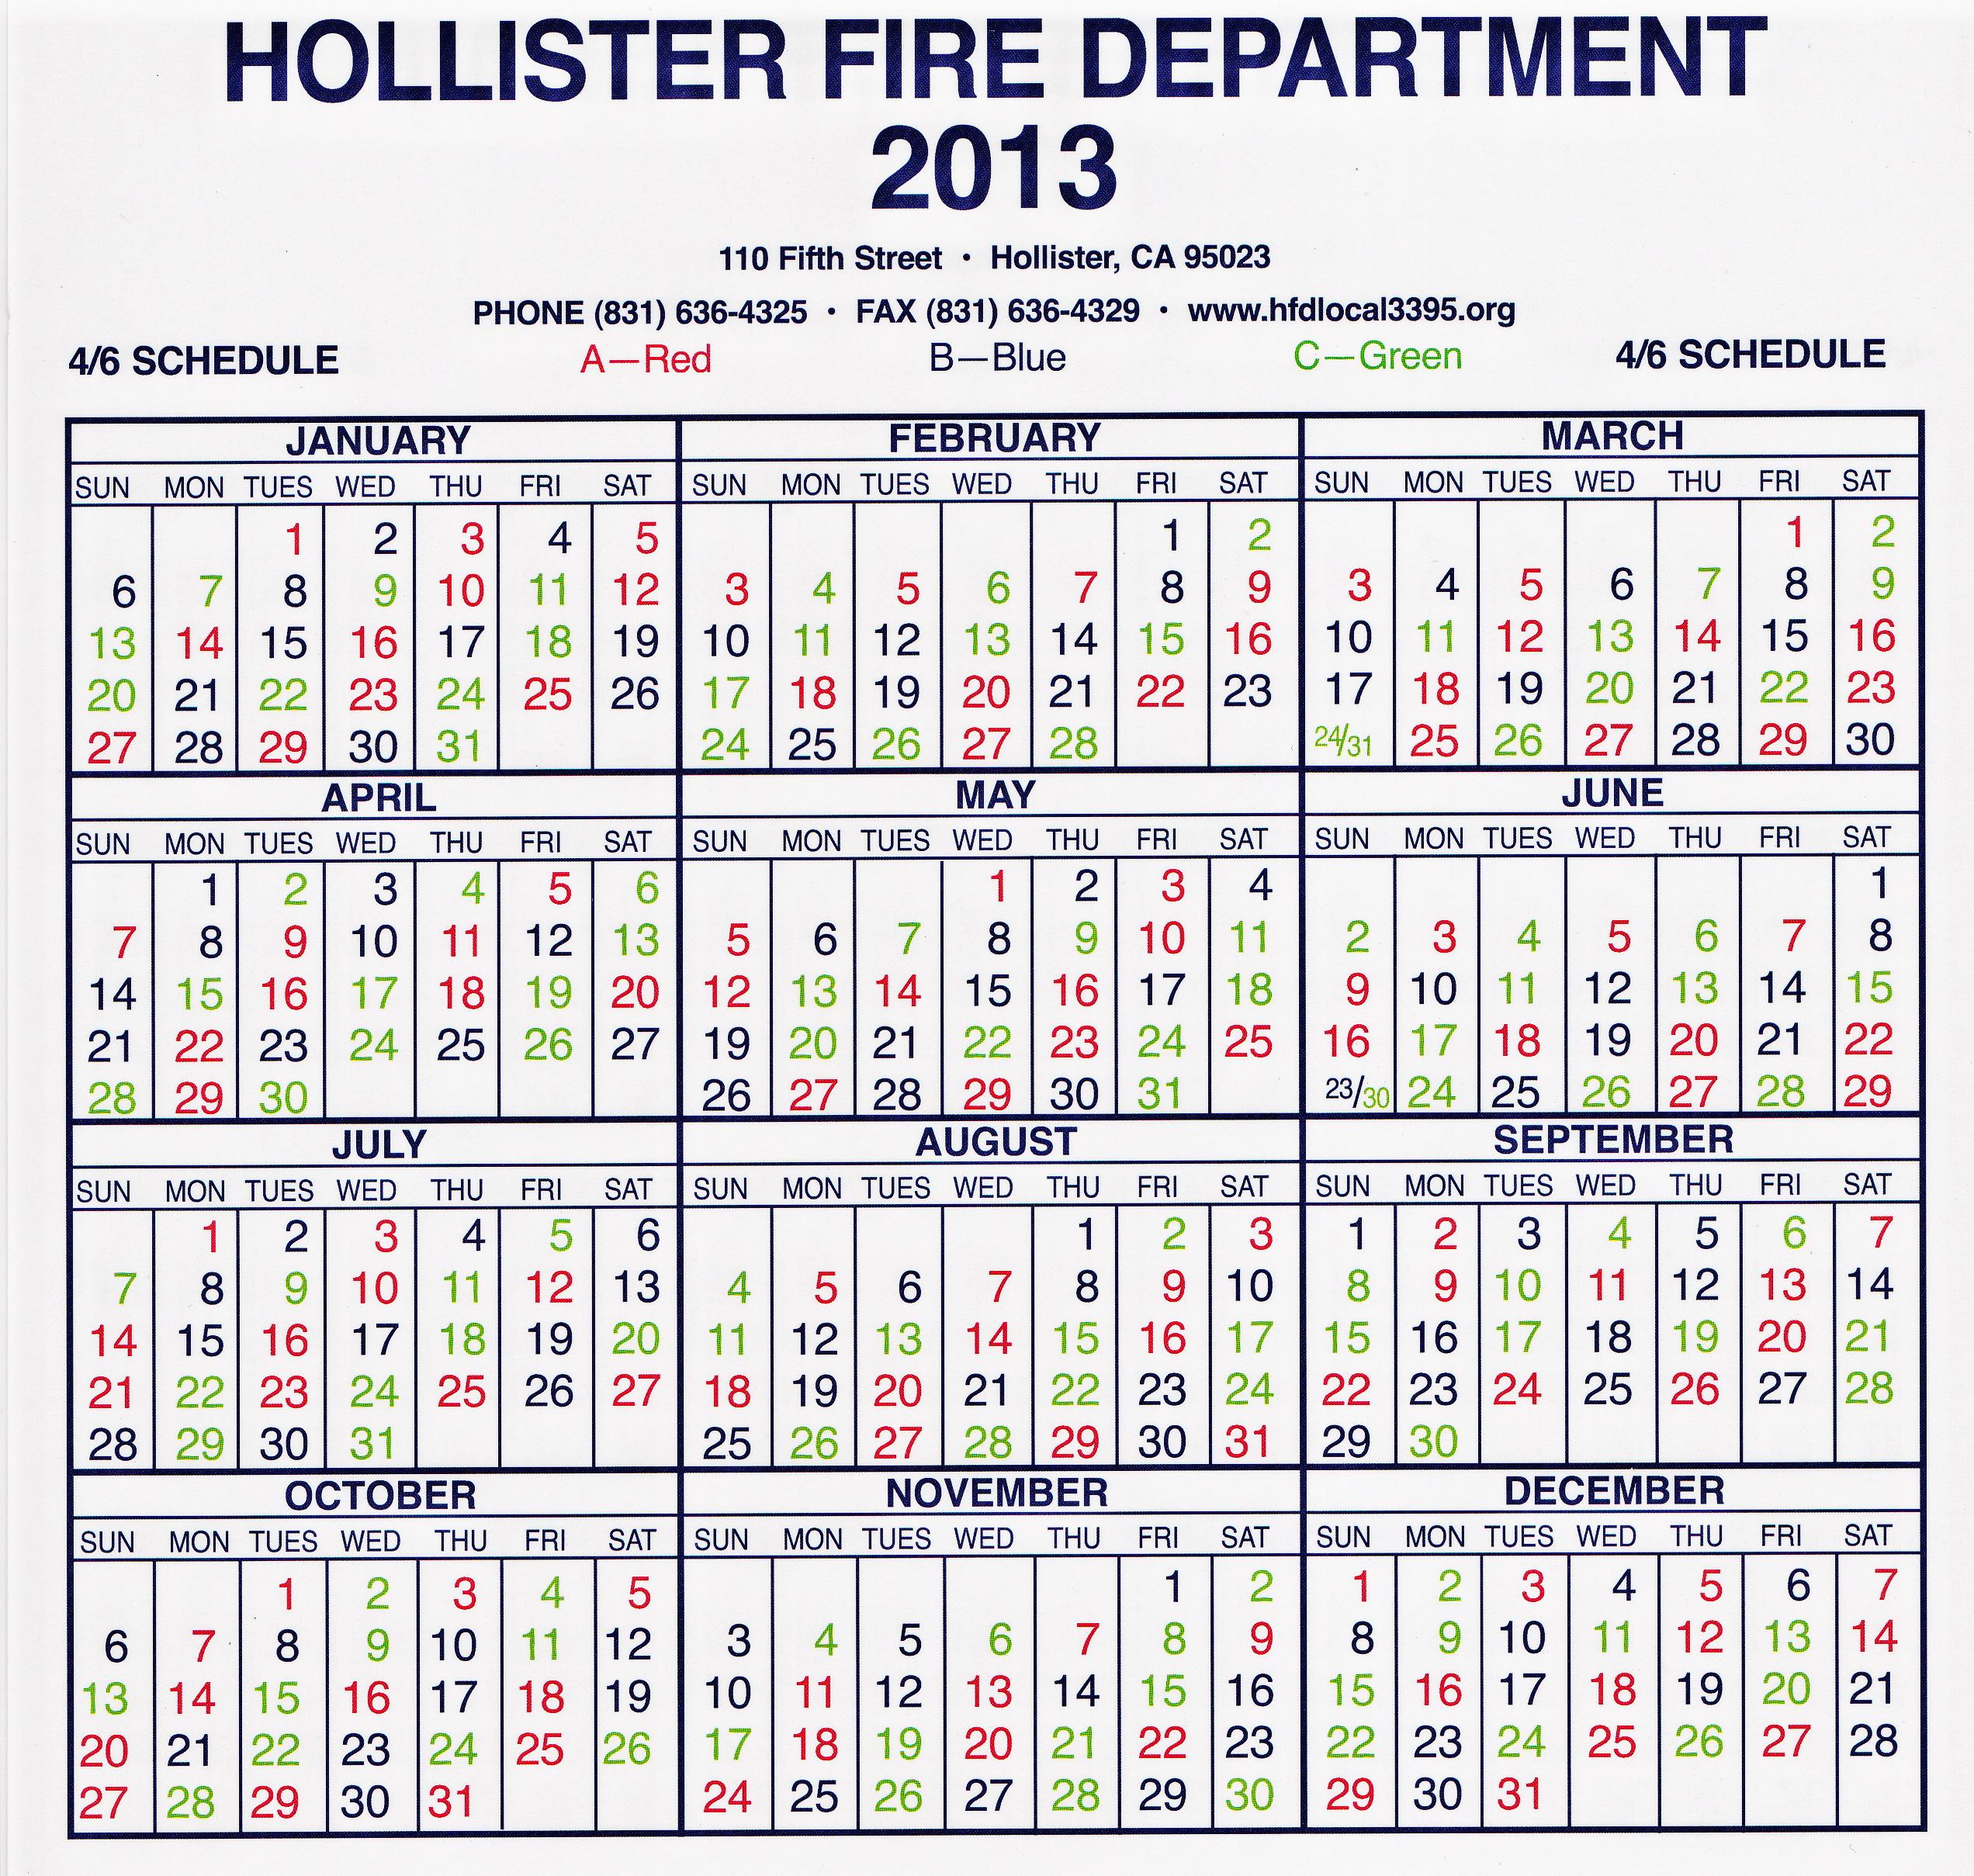 Fire Dept Worksheet | Printable Worksheets And Activities